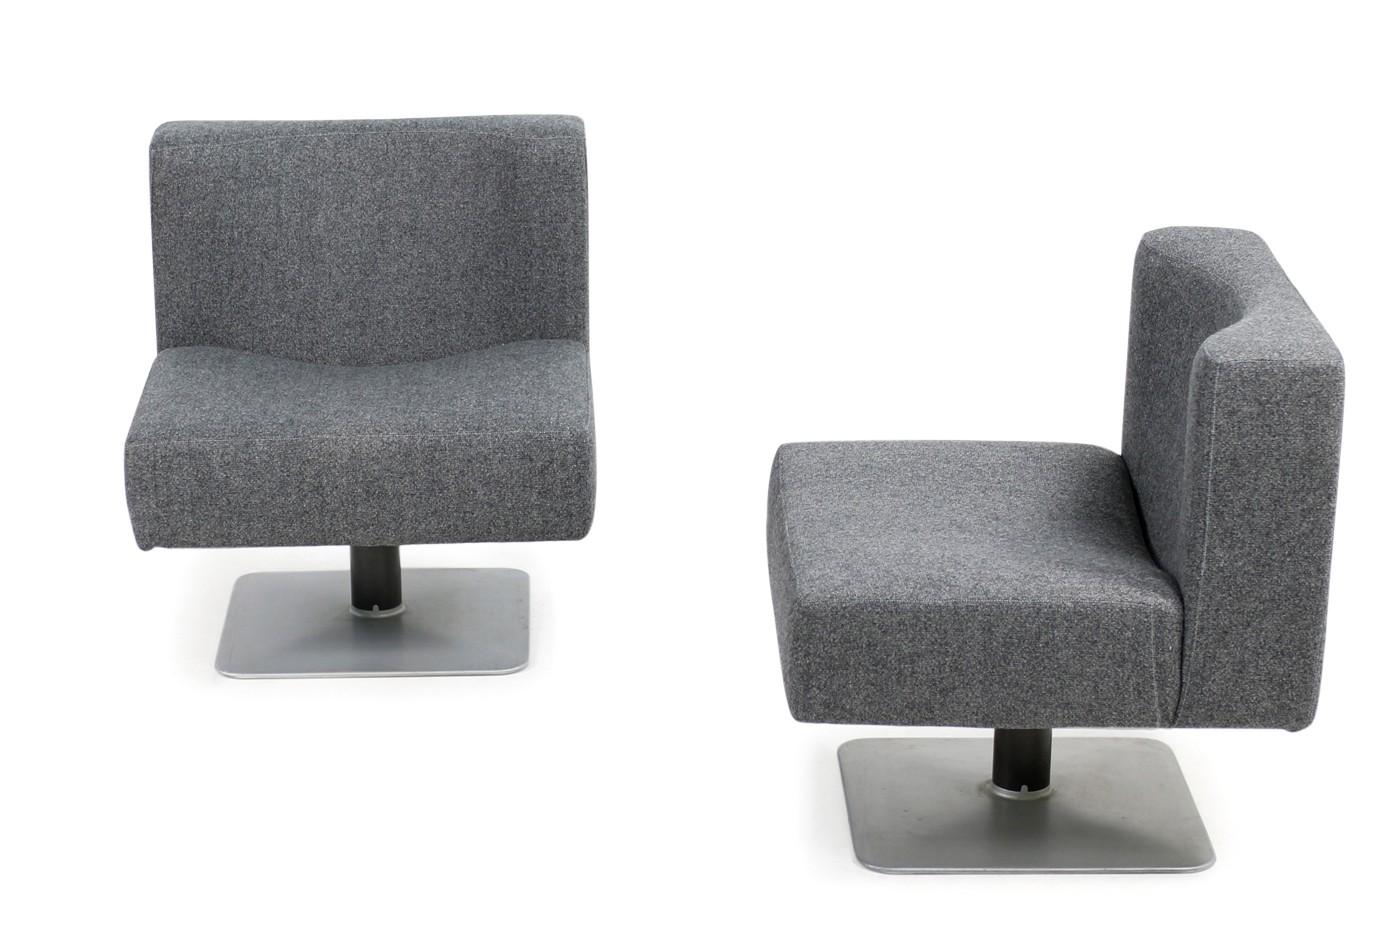 Pair Of 1970s Modular Lounge Chairs Herbert Hirche For